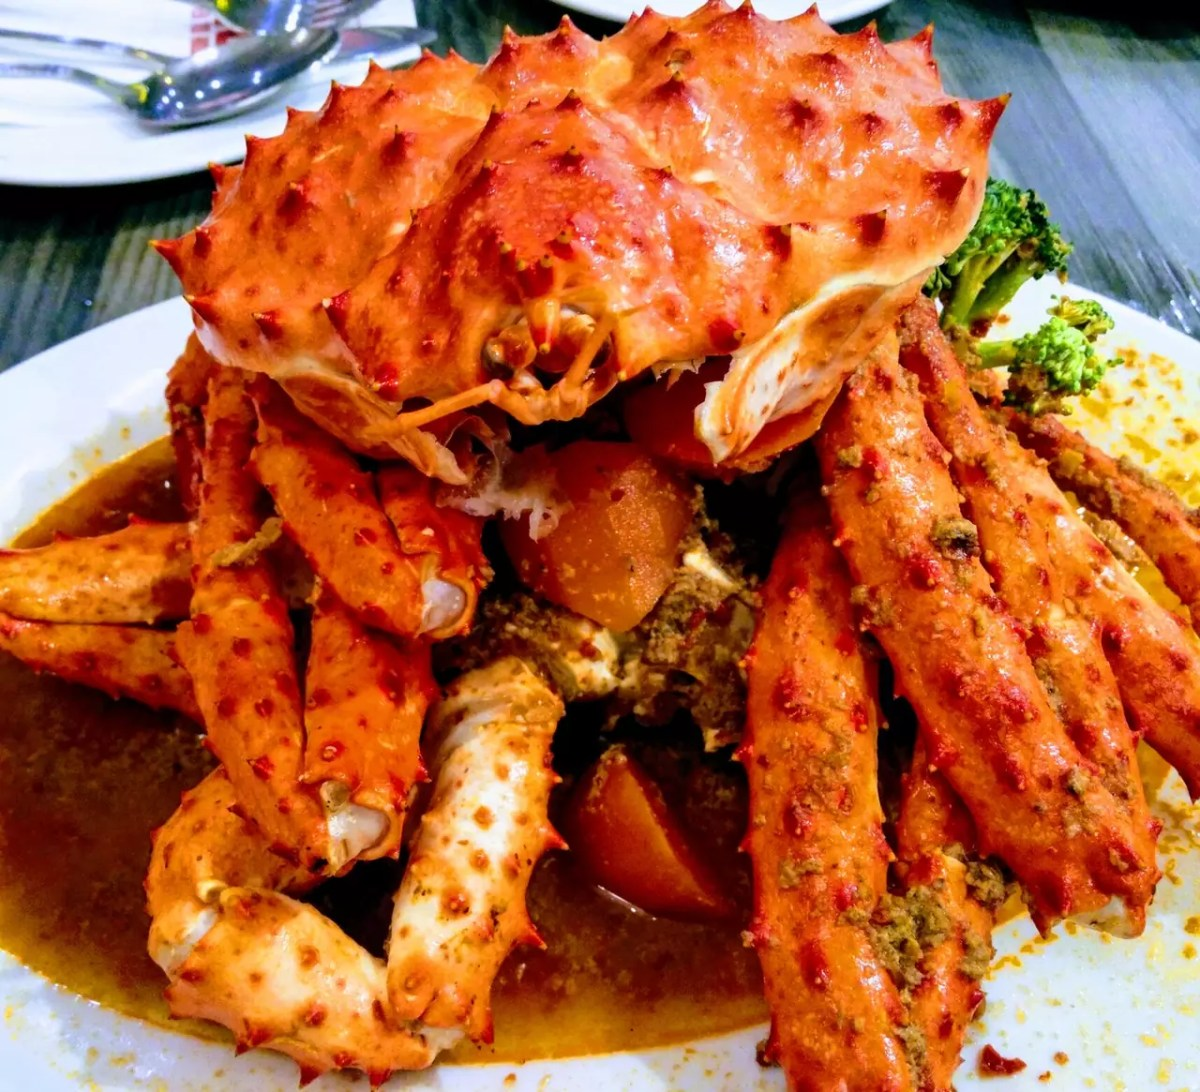 Anthony Bourdain Taipei - Sautéed King Crab - photo by  H H under Pexels License